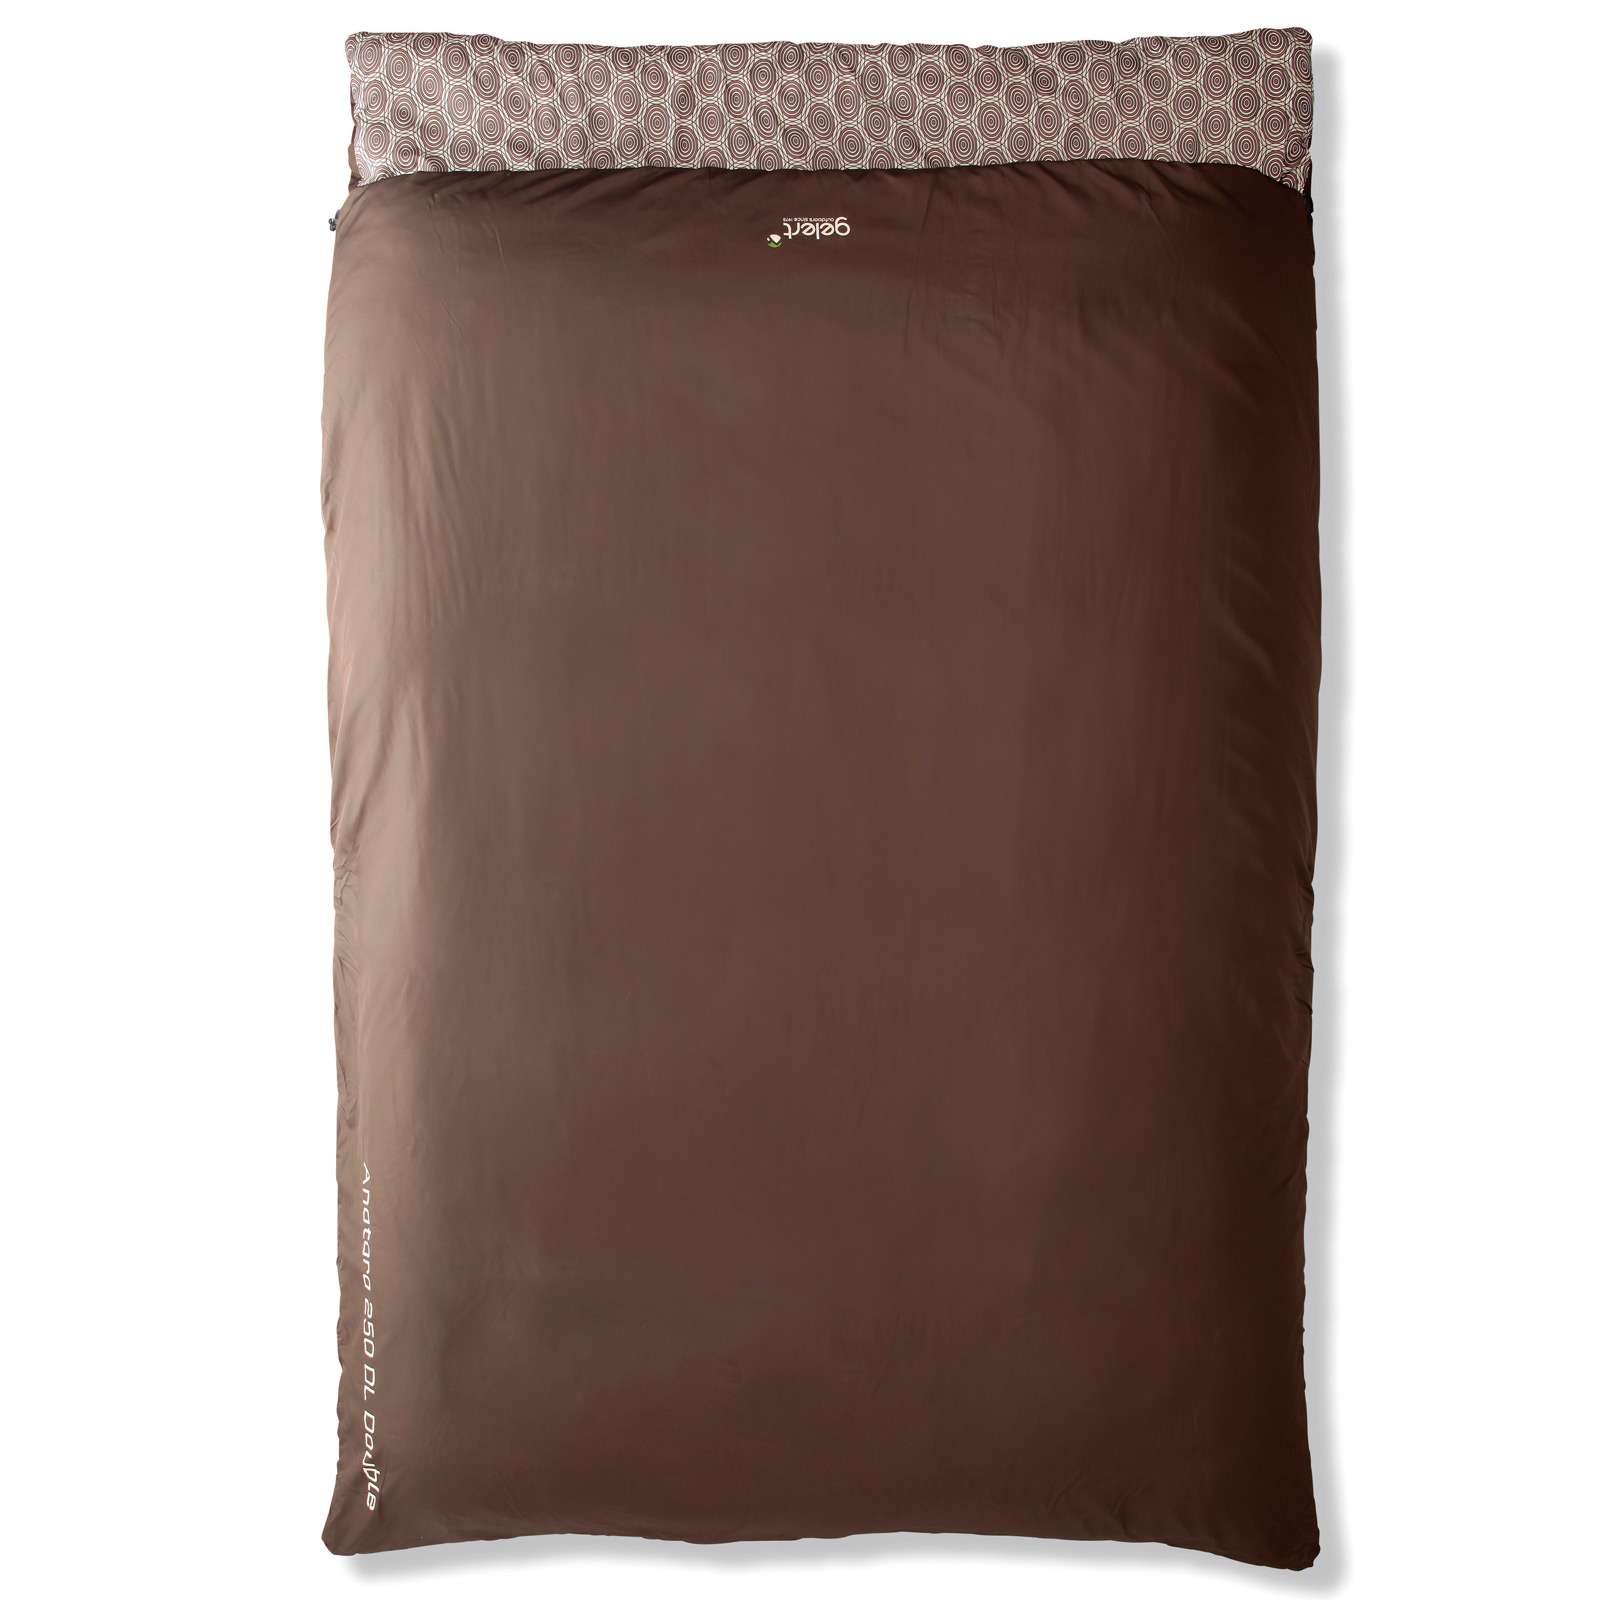 gelert anatara sac de couchage duvet camping double 2 personnes 220x150 cm neuf ebay. Black Bedroom Furniture Sets. Home Design Ideas